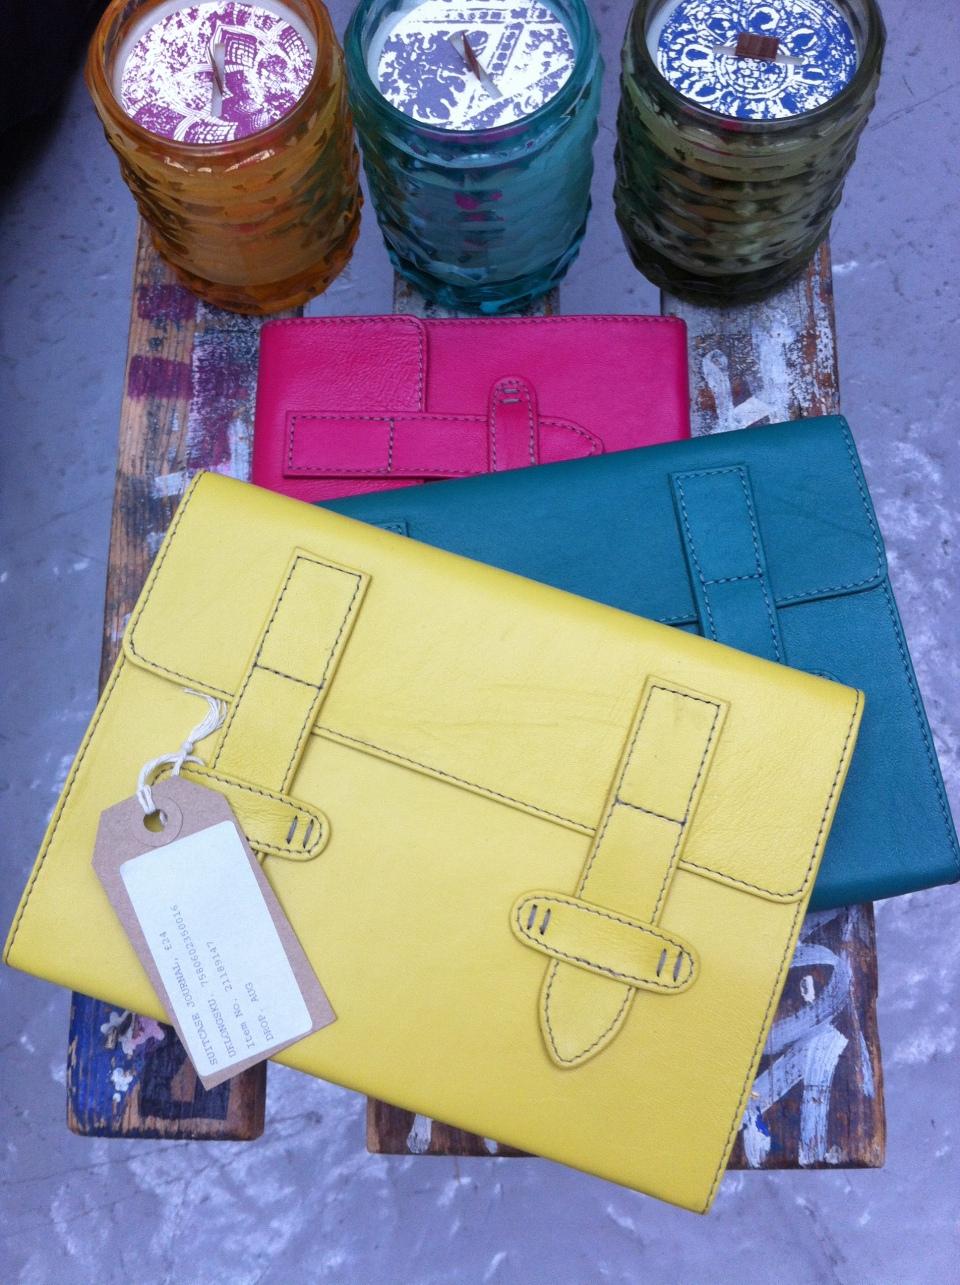 satchels, wallets, notebooks